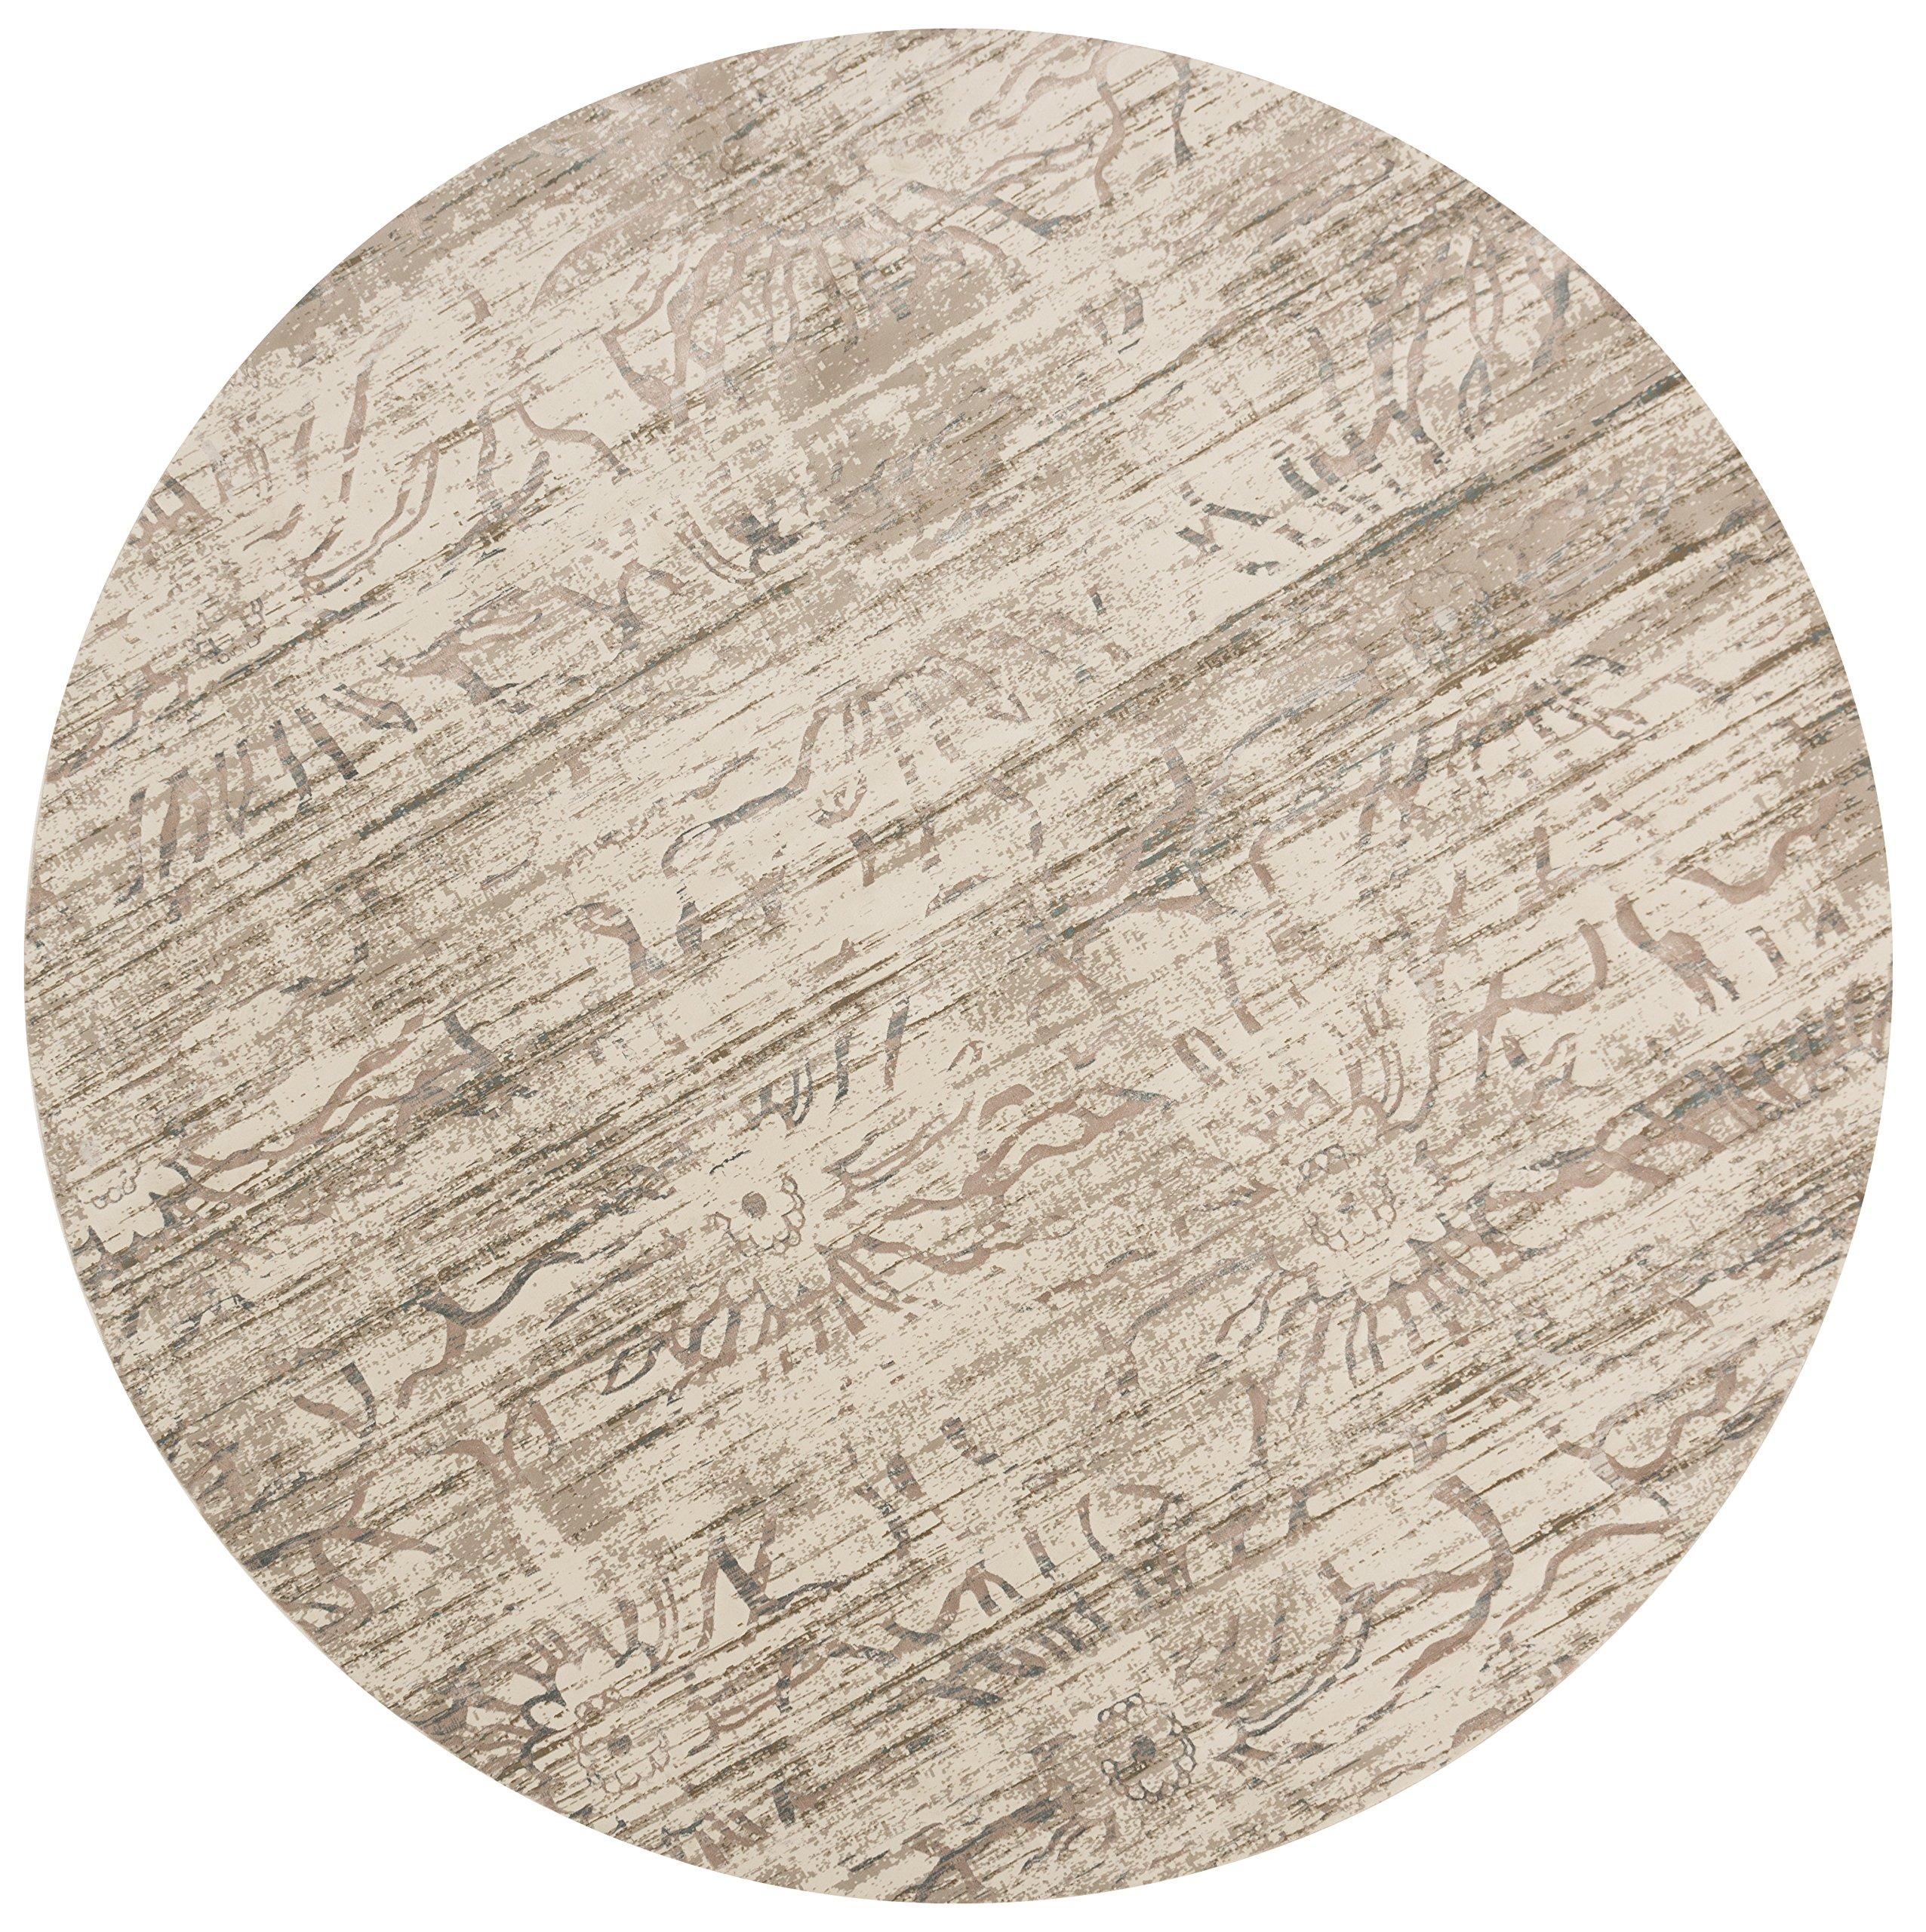 Loloi Rugs Kingston Collection KGSTKT-03NE00930R Round Area Rug, 9' 3'' x 9' 3'', Neutral